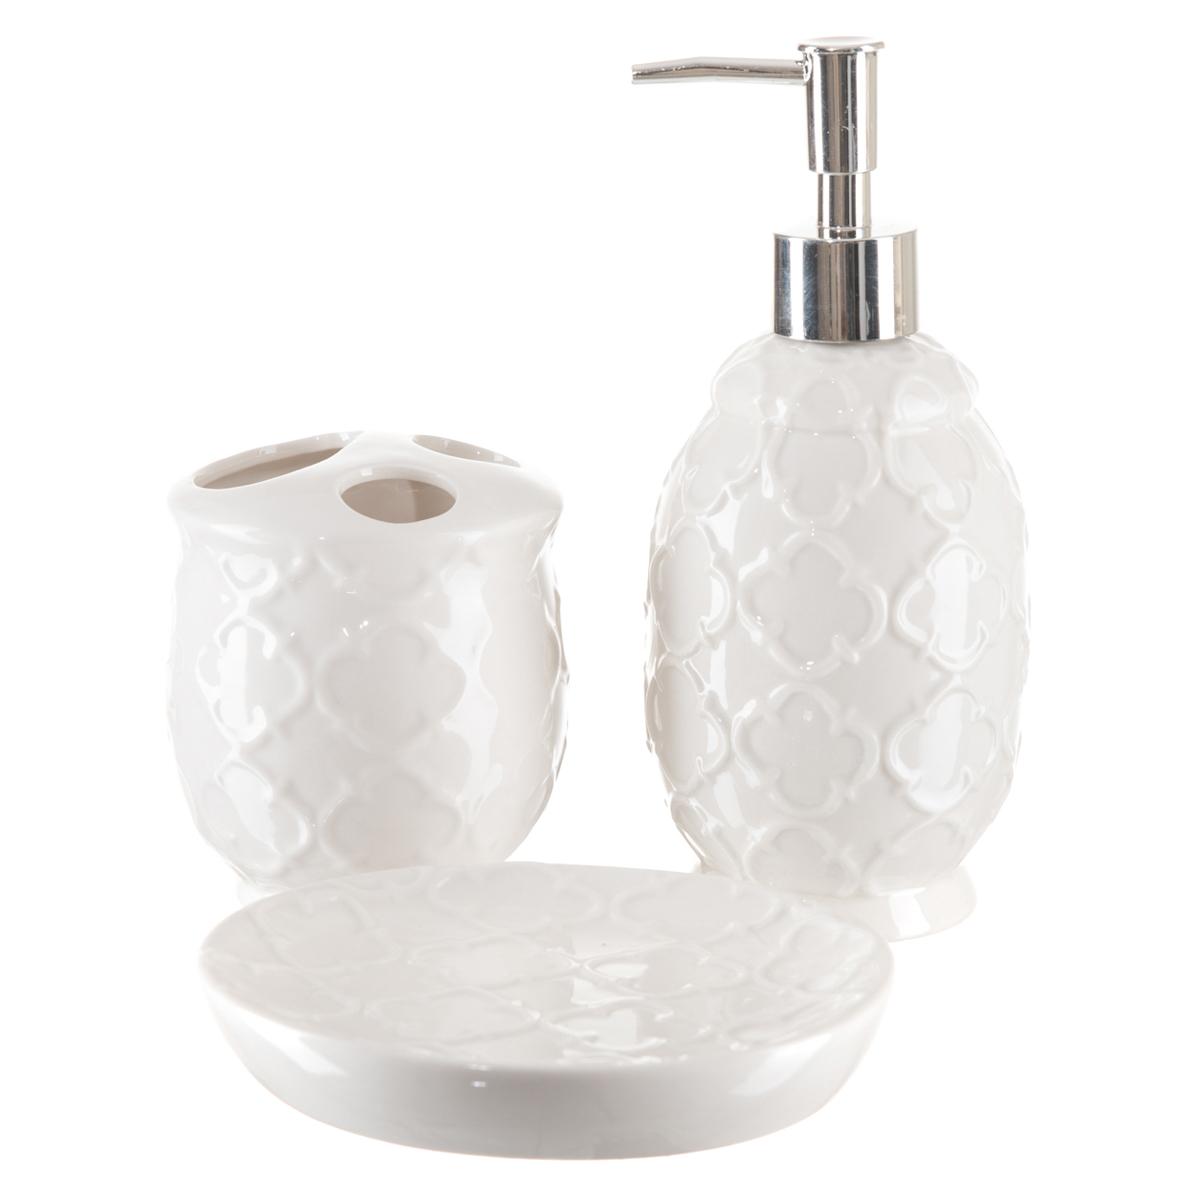 Kit Banheiro Lavabo Dispenser Sabonete Líquido 3 Peças / KB-060